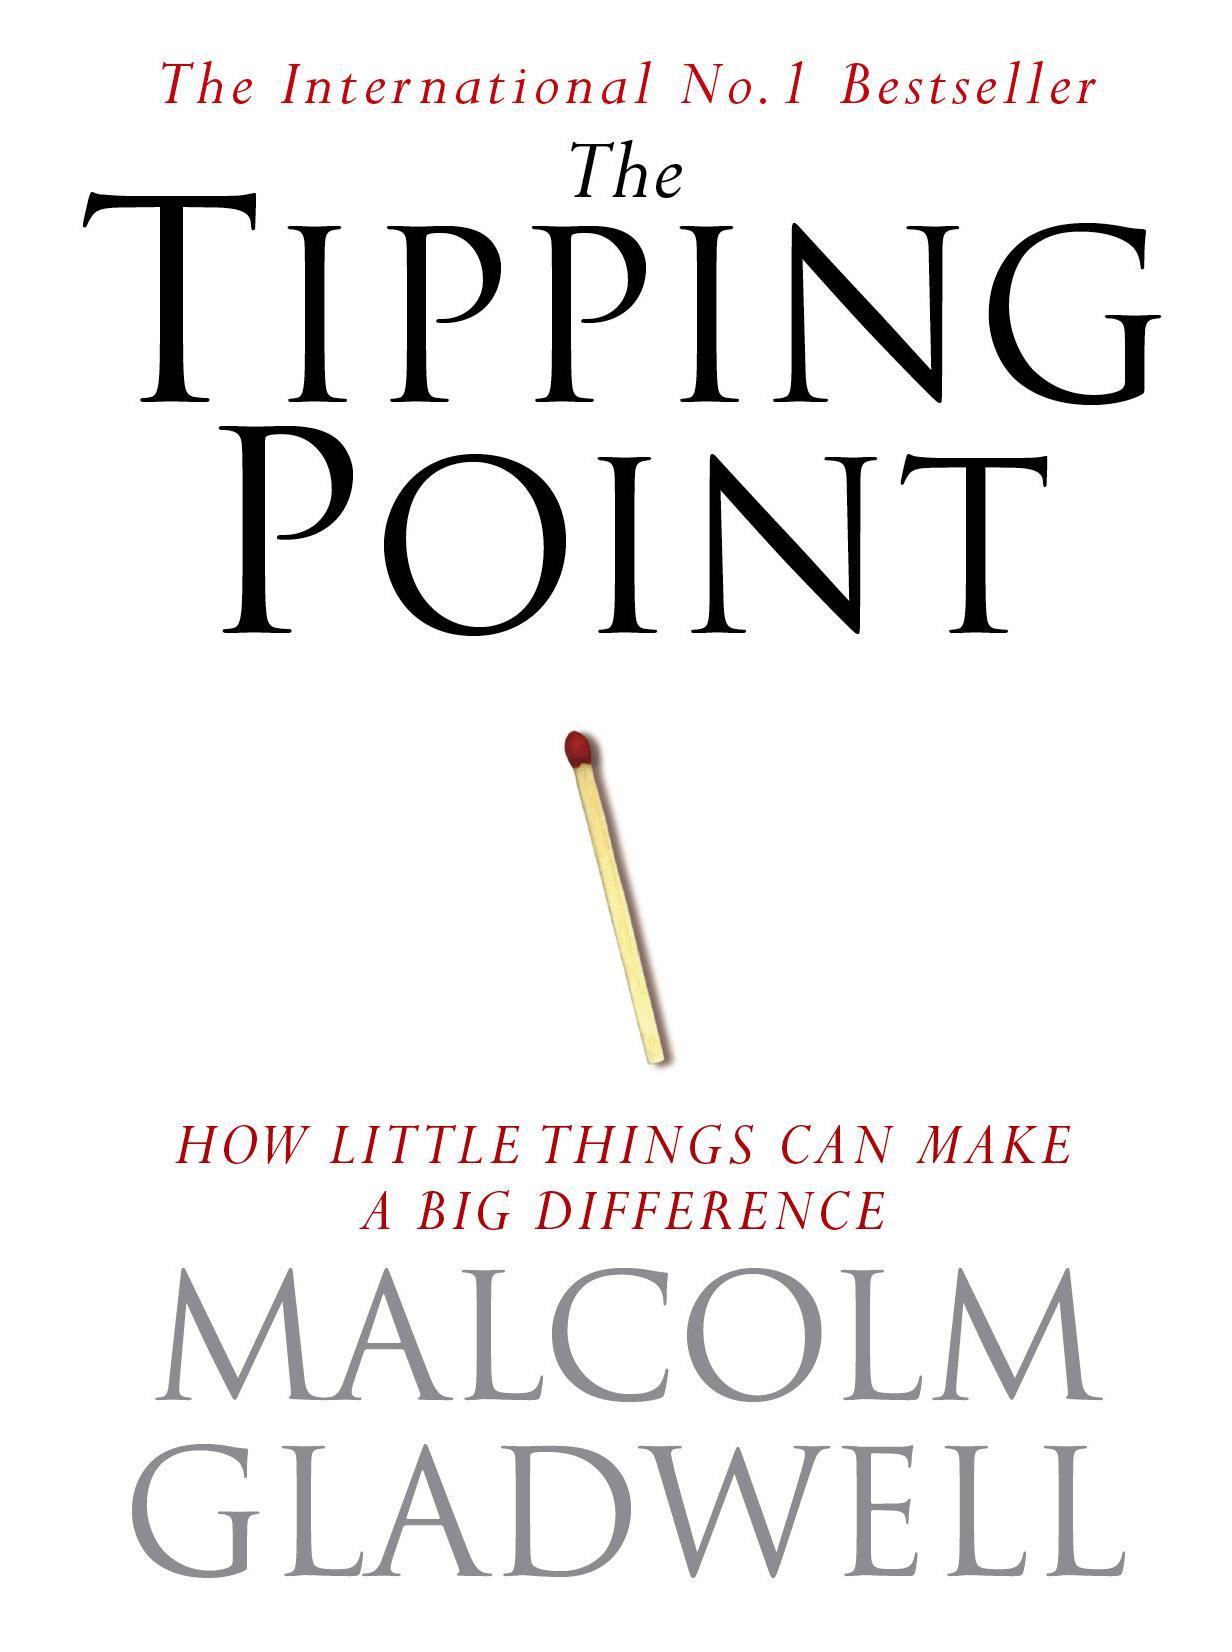 TippingPoint - மால்கம் க்ளாட்வெல்